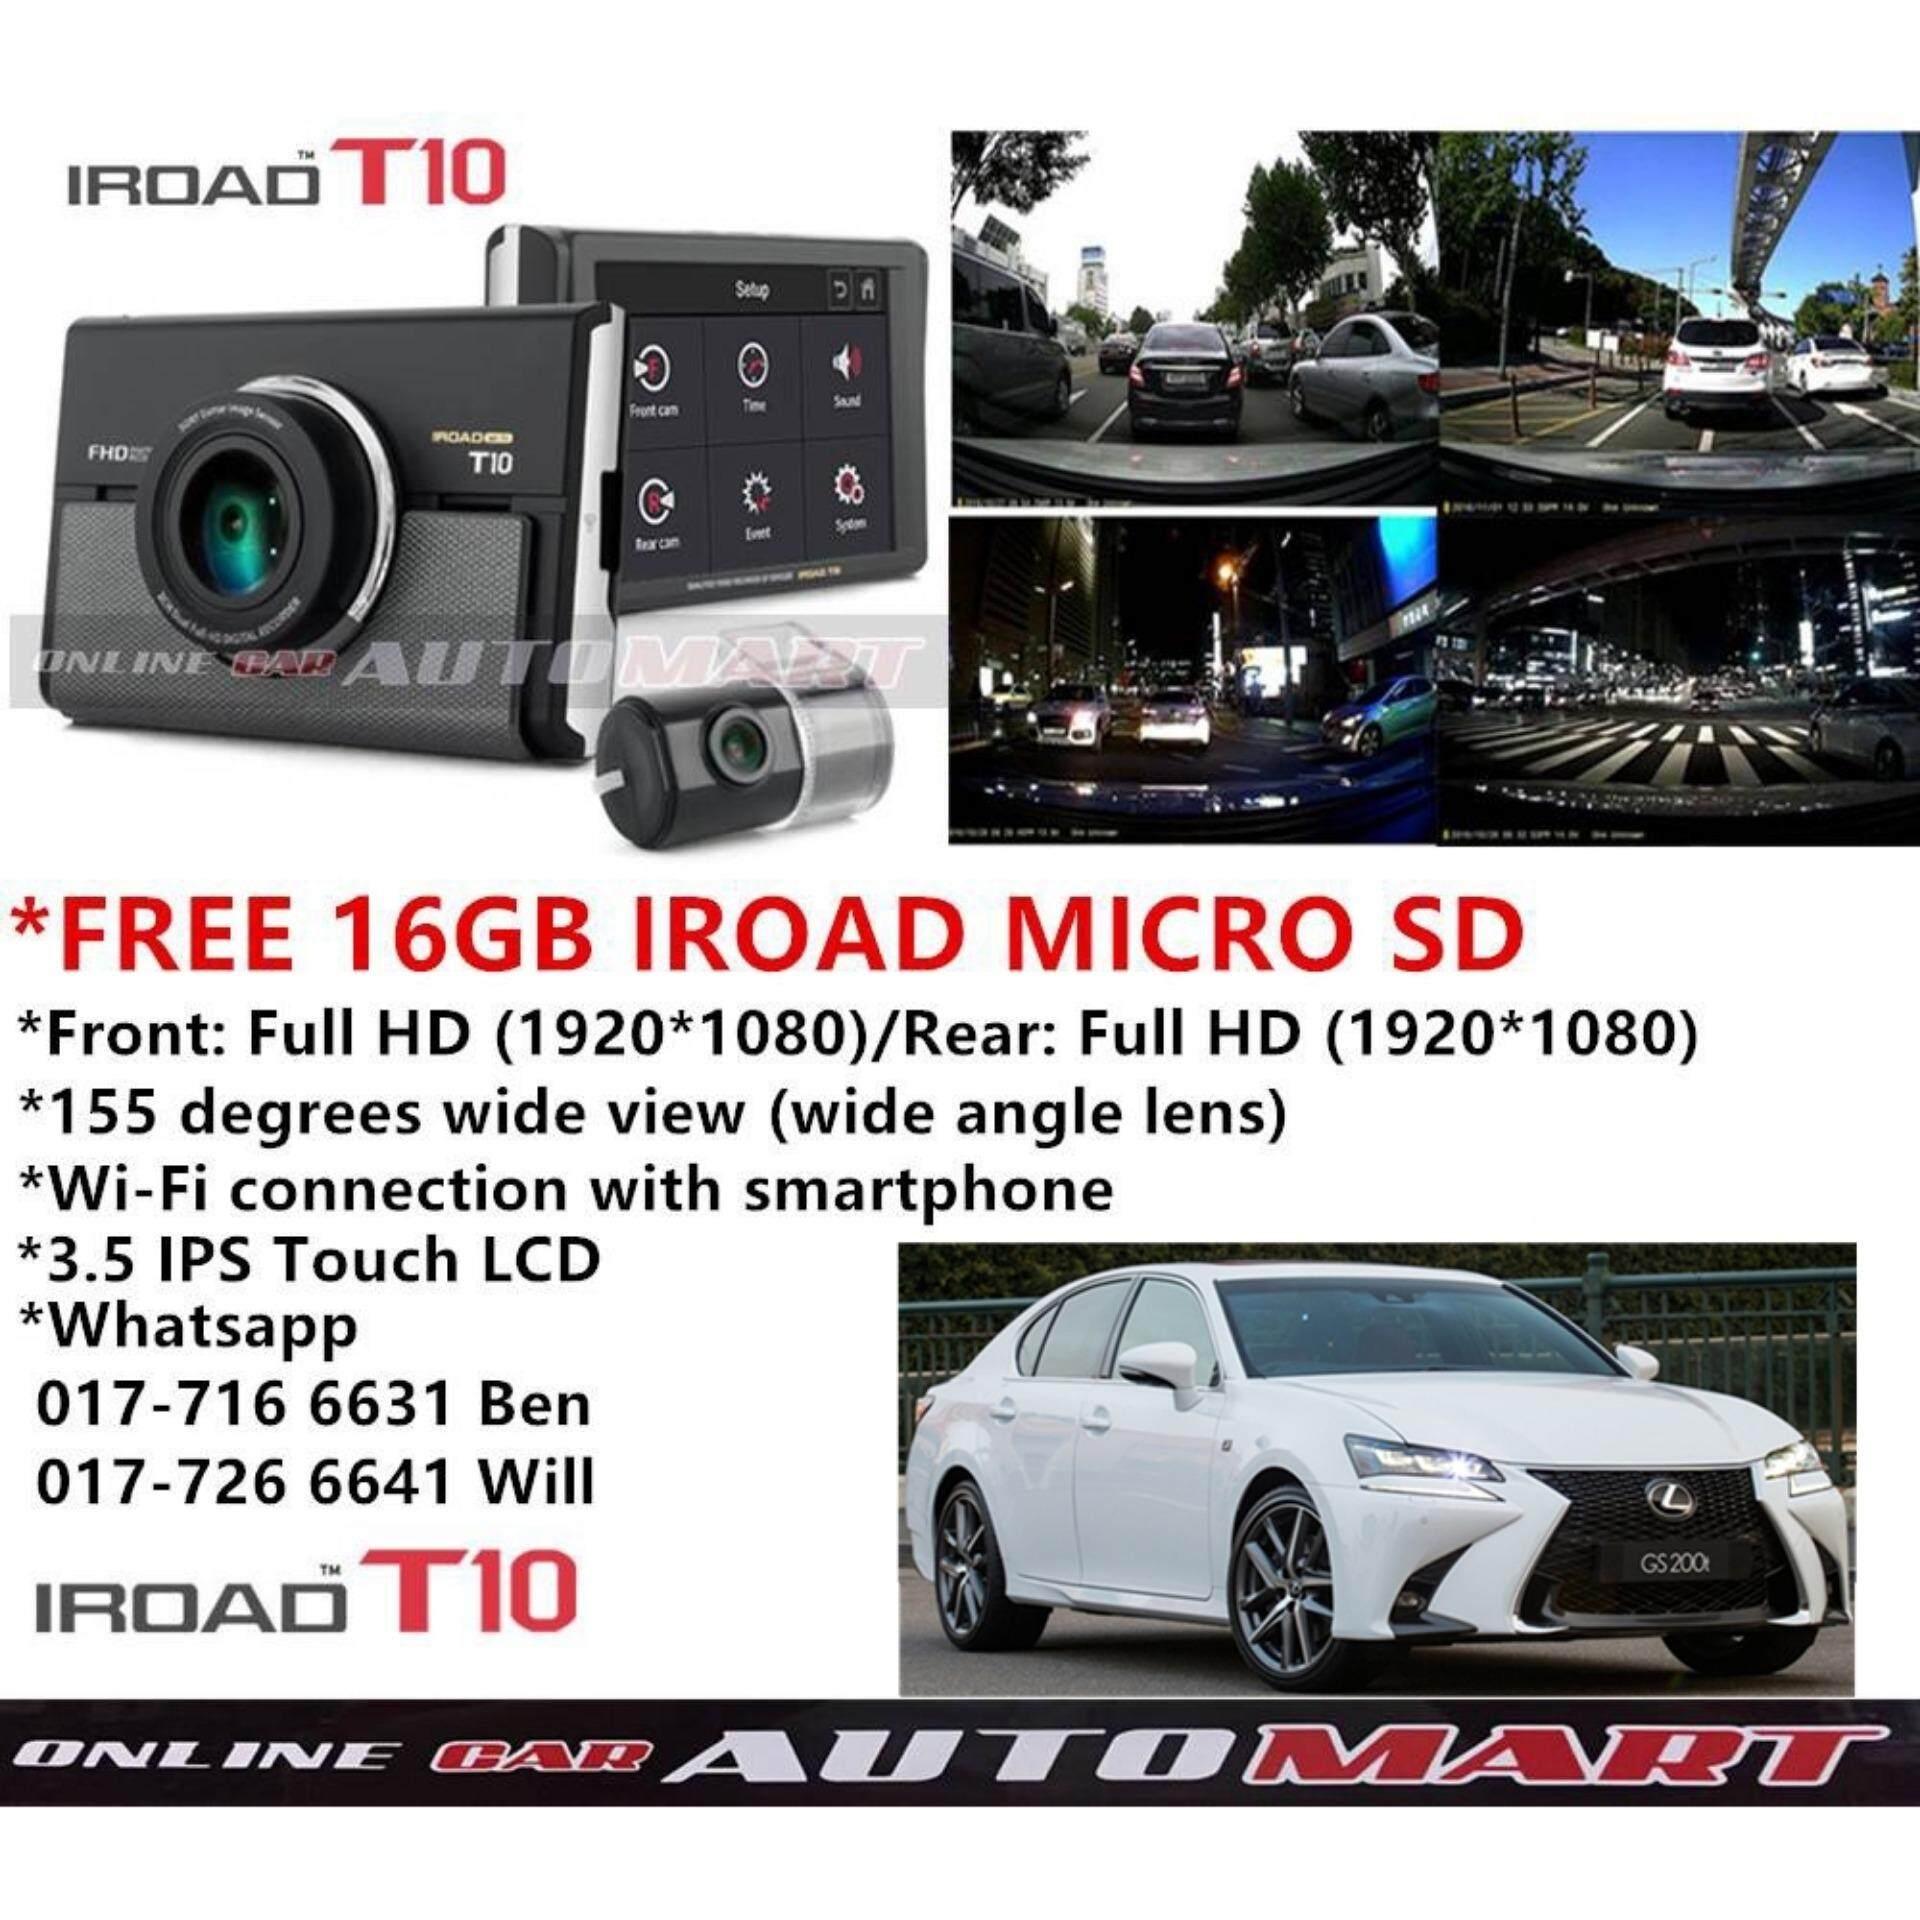 Online Car Accessories Digital Camera Action Lexus Gs350 Fuse Box Gs200t Iroad T10 Wifi Lcd 2ch Blackbox Dashcam 16gb Gps